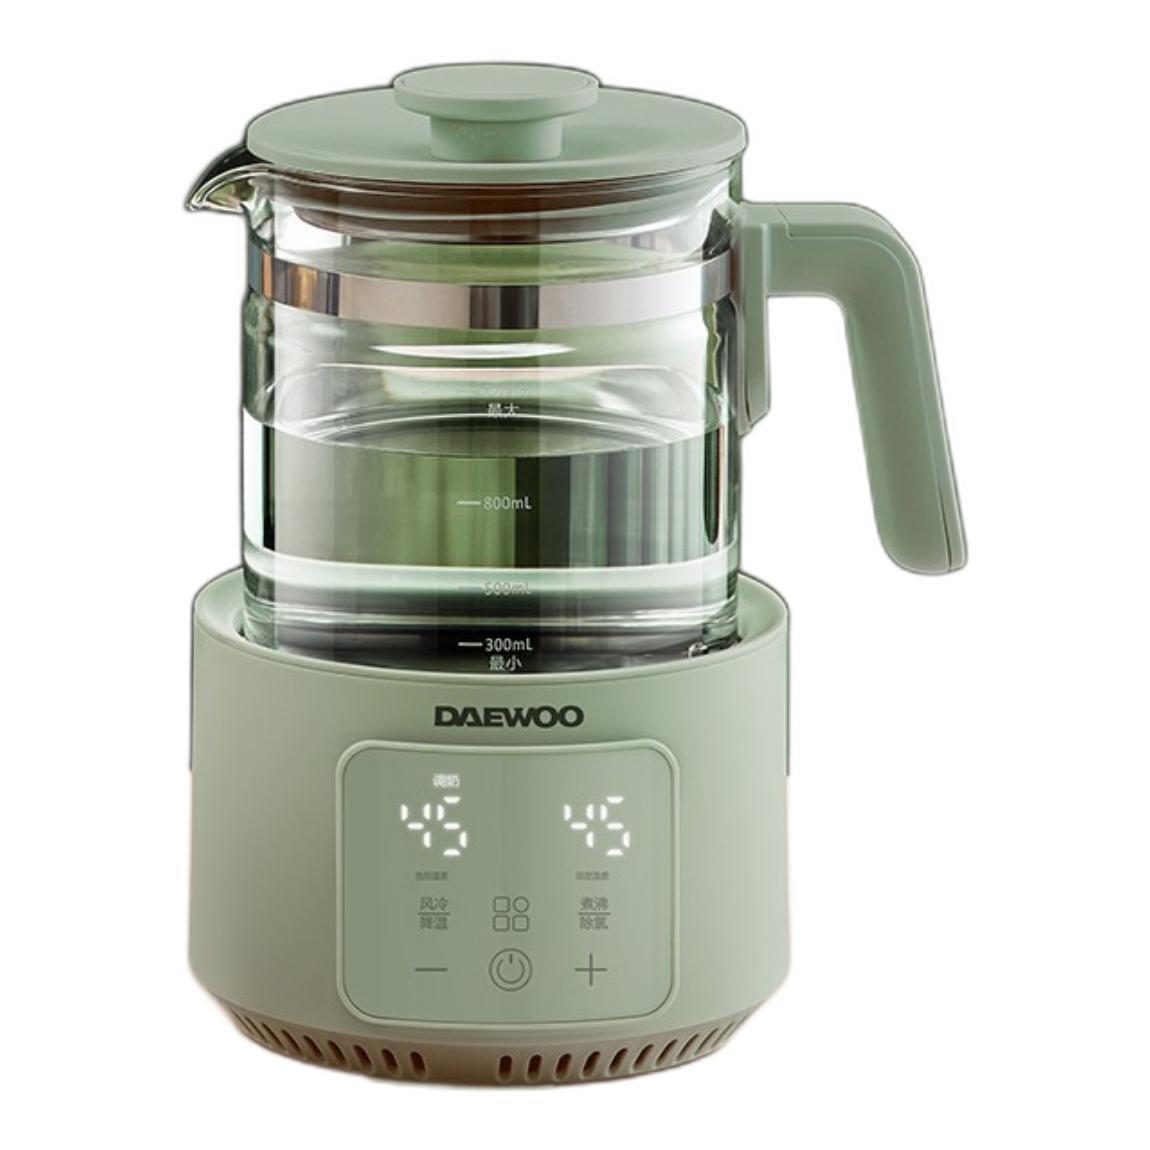 DAEWOO 大宇 DY-TN11 婴儿单机恒温调奶器 1200ml